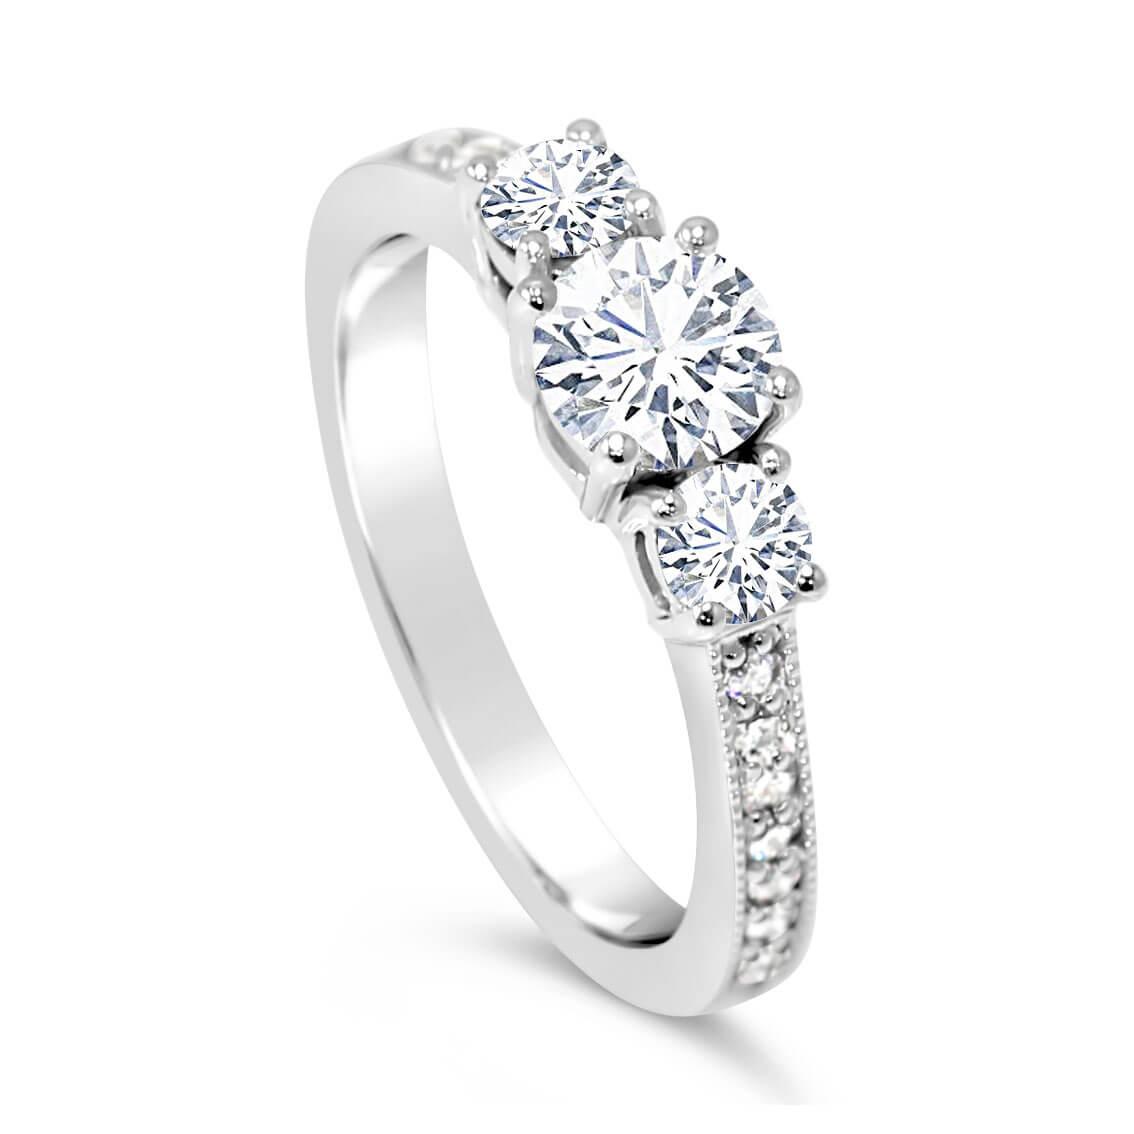 Trilogy Diamond Engagement Ring Band